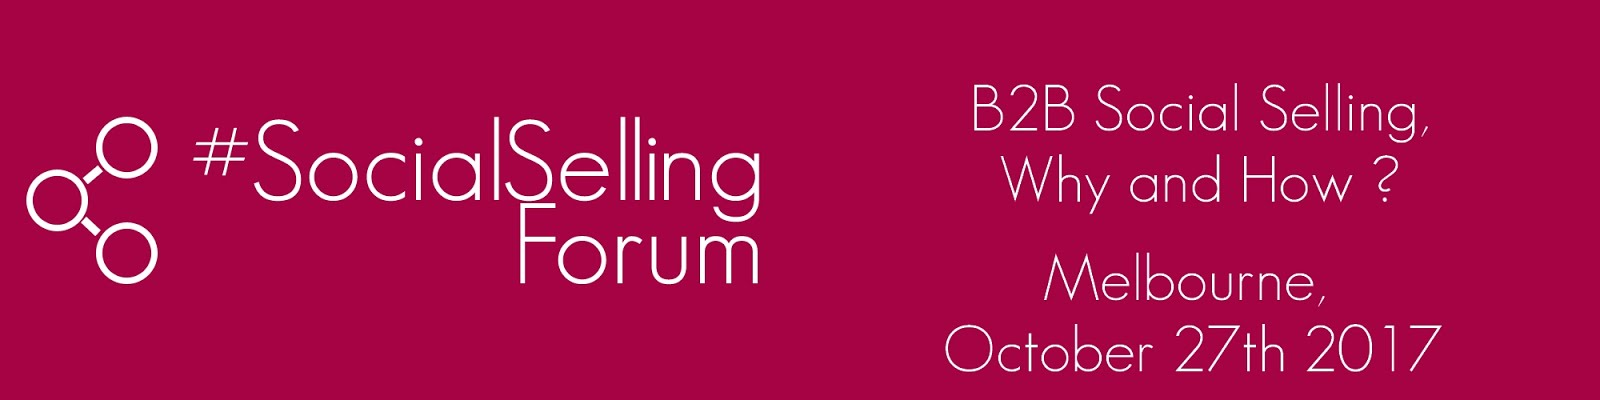 #SocialSellingForum